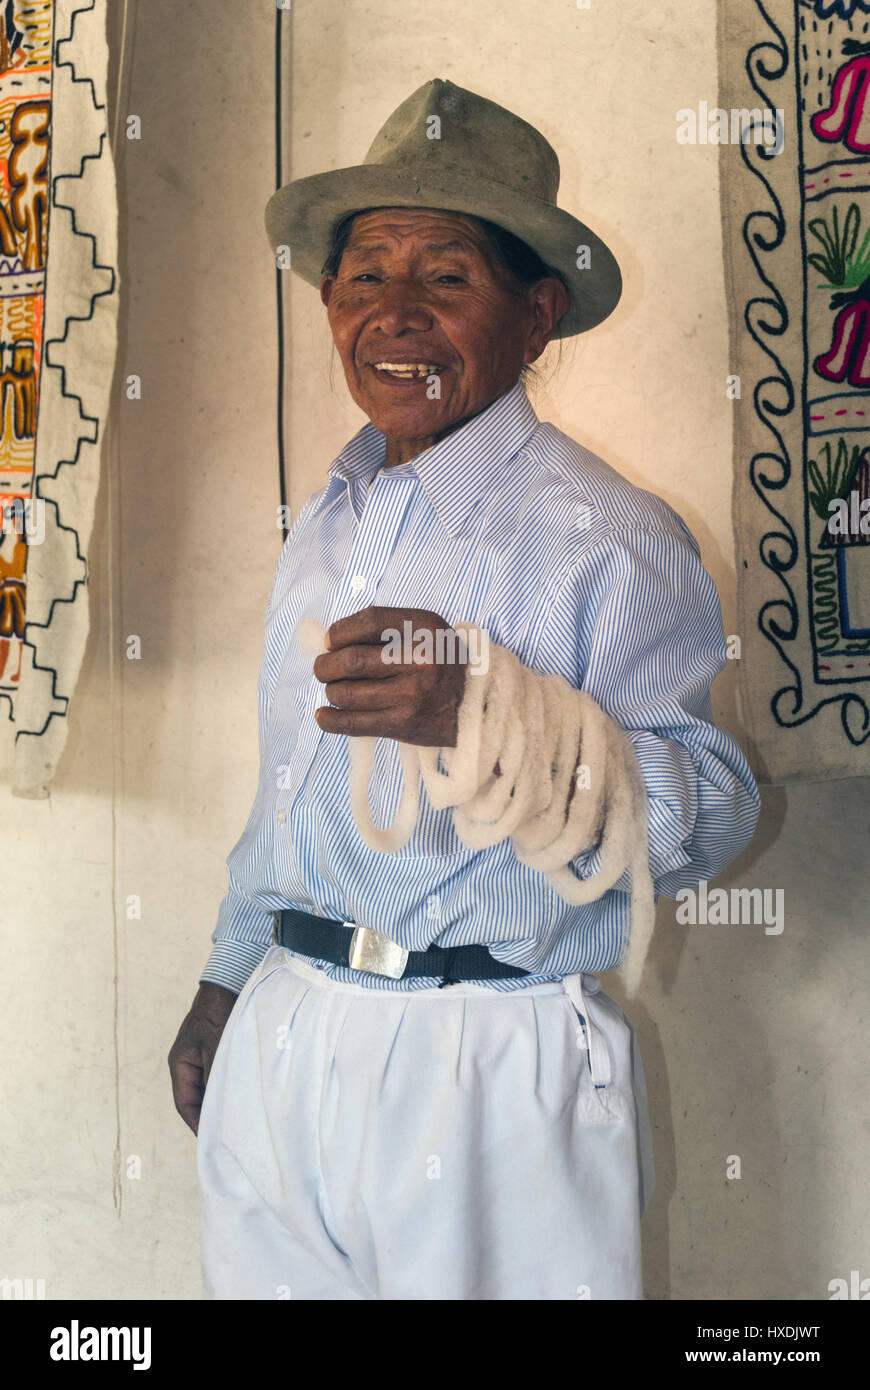 Ecuador, Otavalo, Artisan weaver holding carded wool - Stock Image